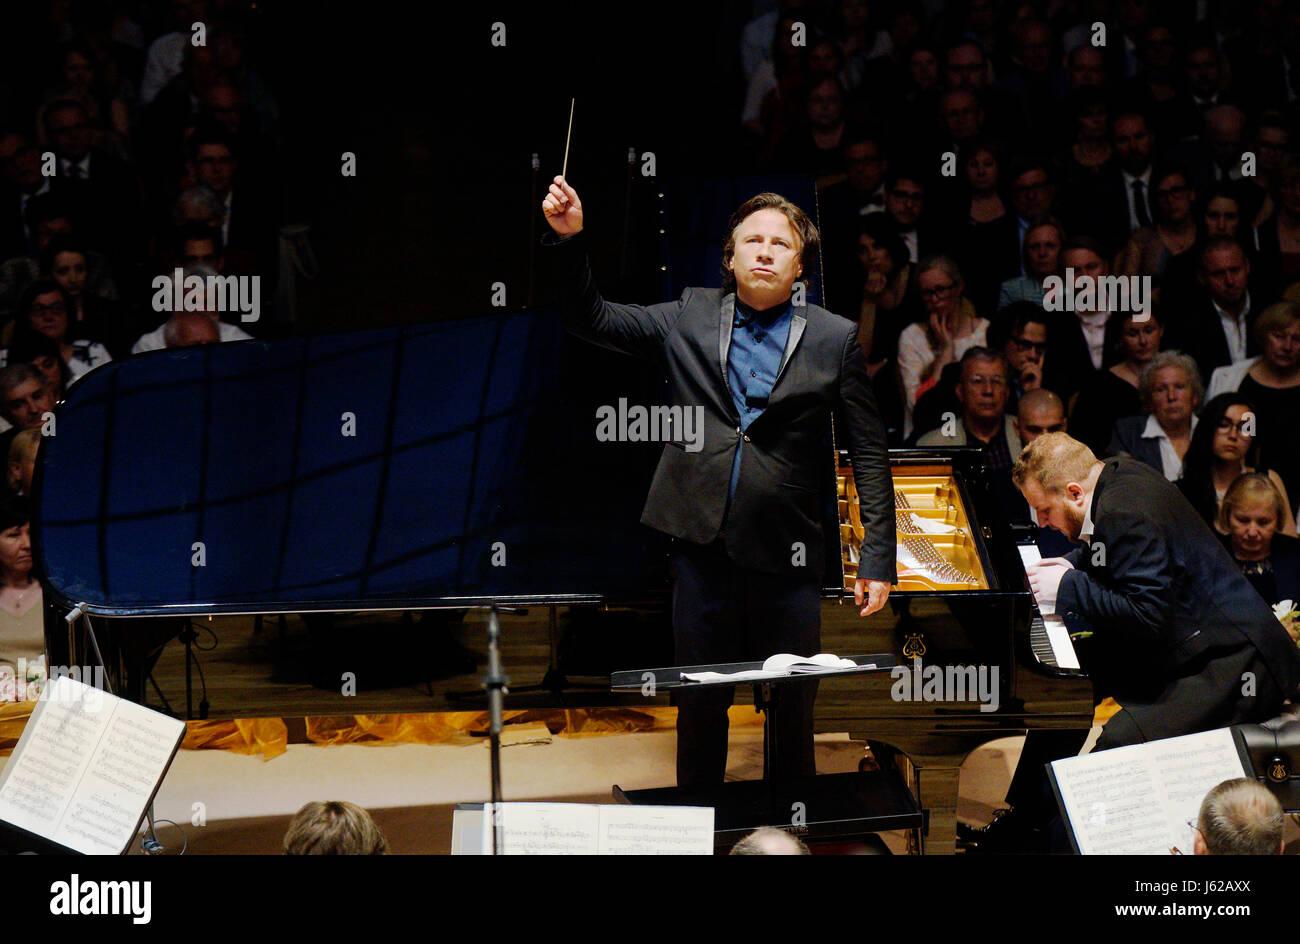 Czech piano player Lukas Vondracek (right) and Estonian conductor Kristjan Jarvi (left)  accompanied by the Czech - Stock Image